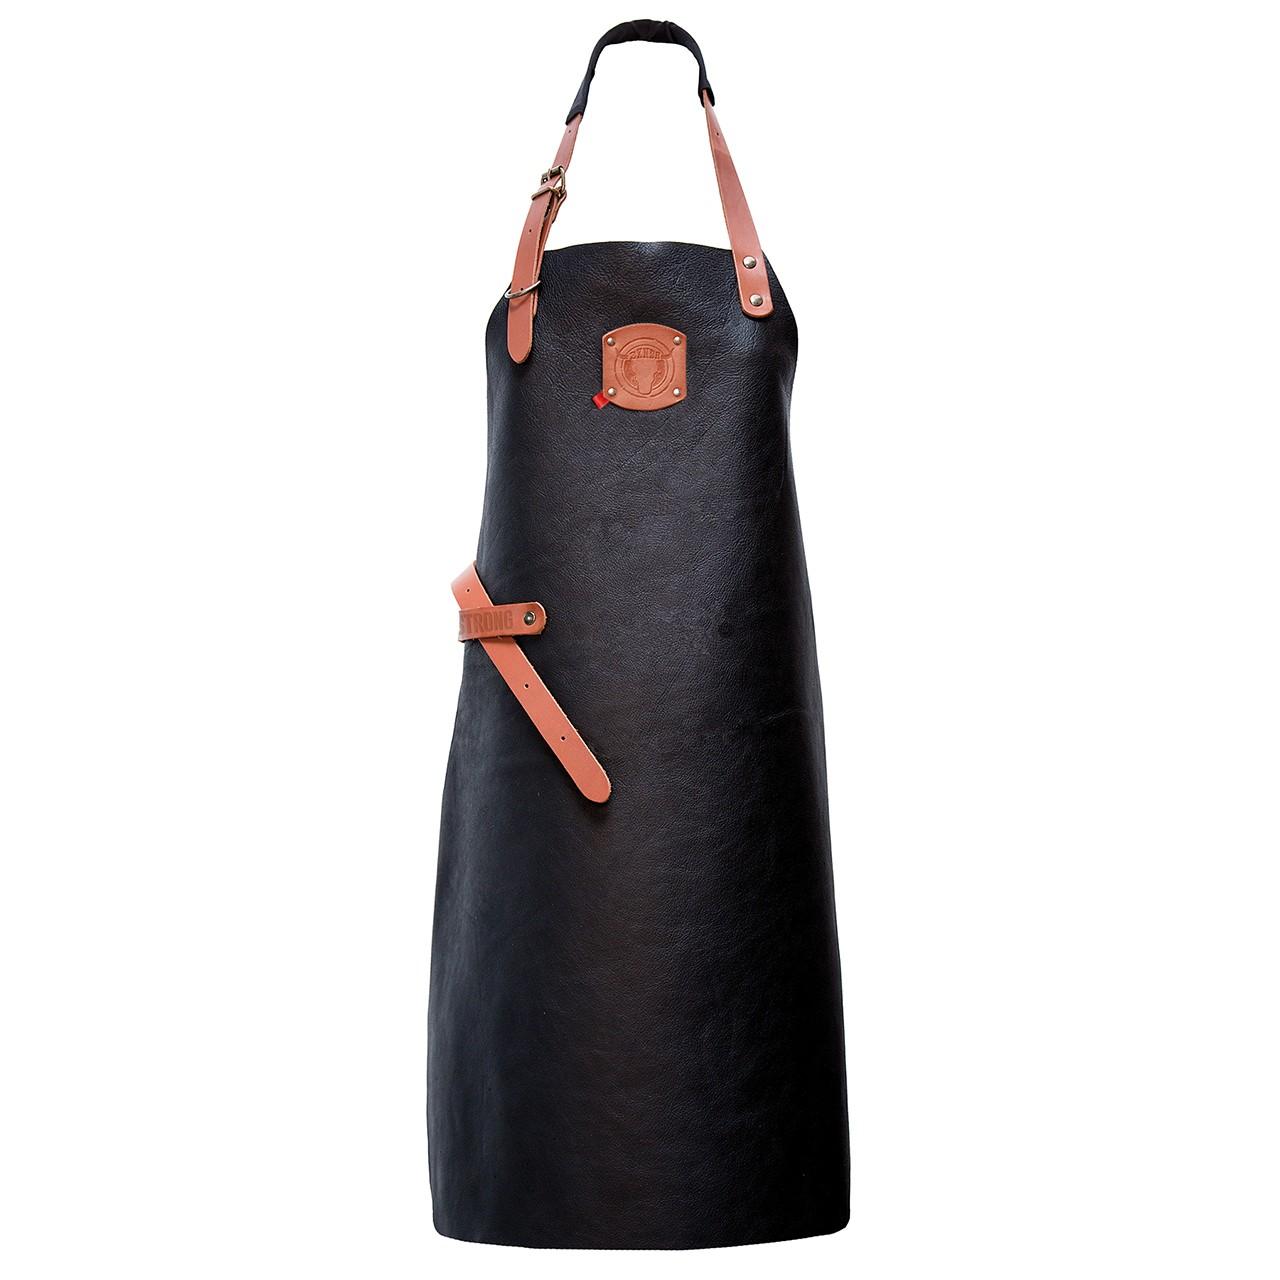 Leder Latzschürze BBQ Exner® | bedrucken, besticken, bedrucken lassen, besticken lassen, mit Logo |